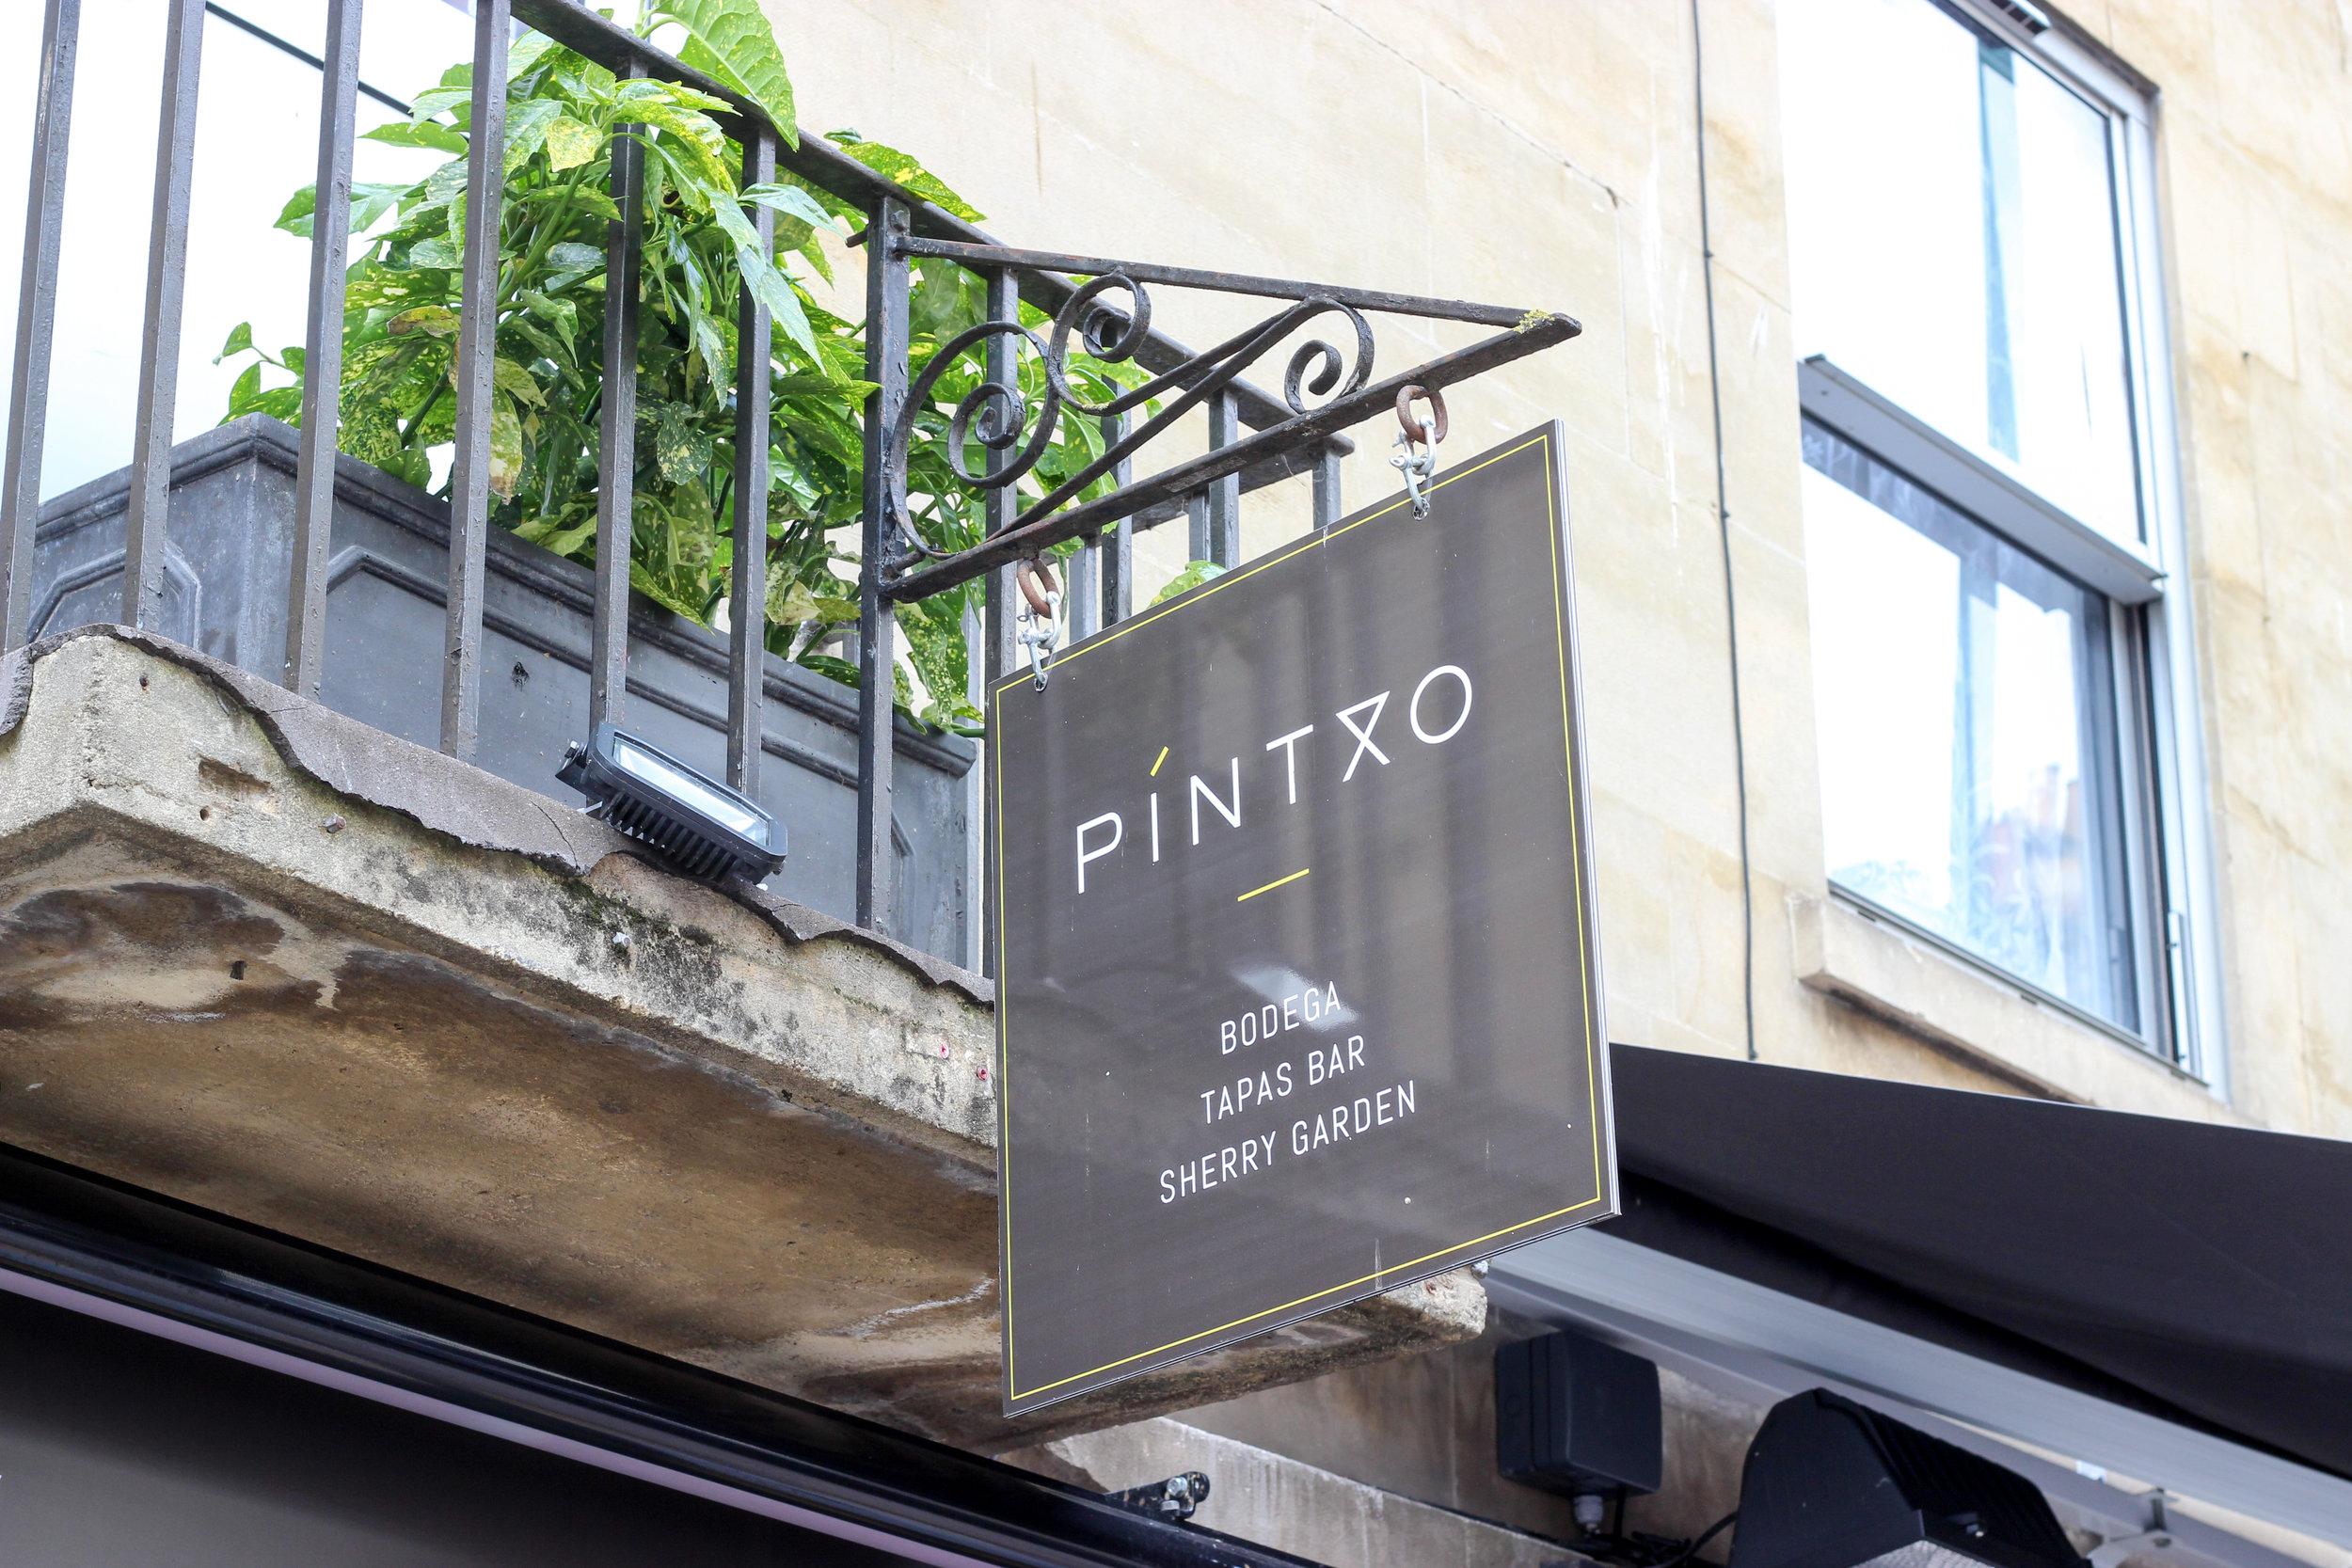 Pintxo de Bath Restaurant Review